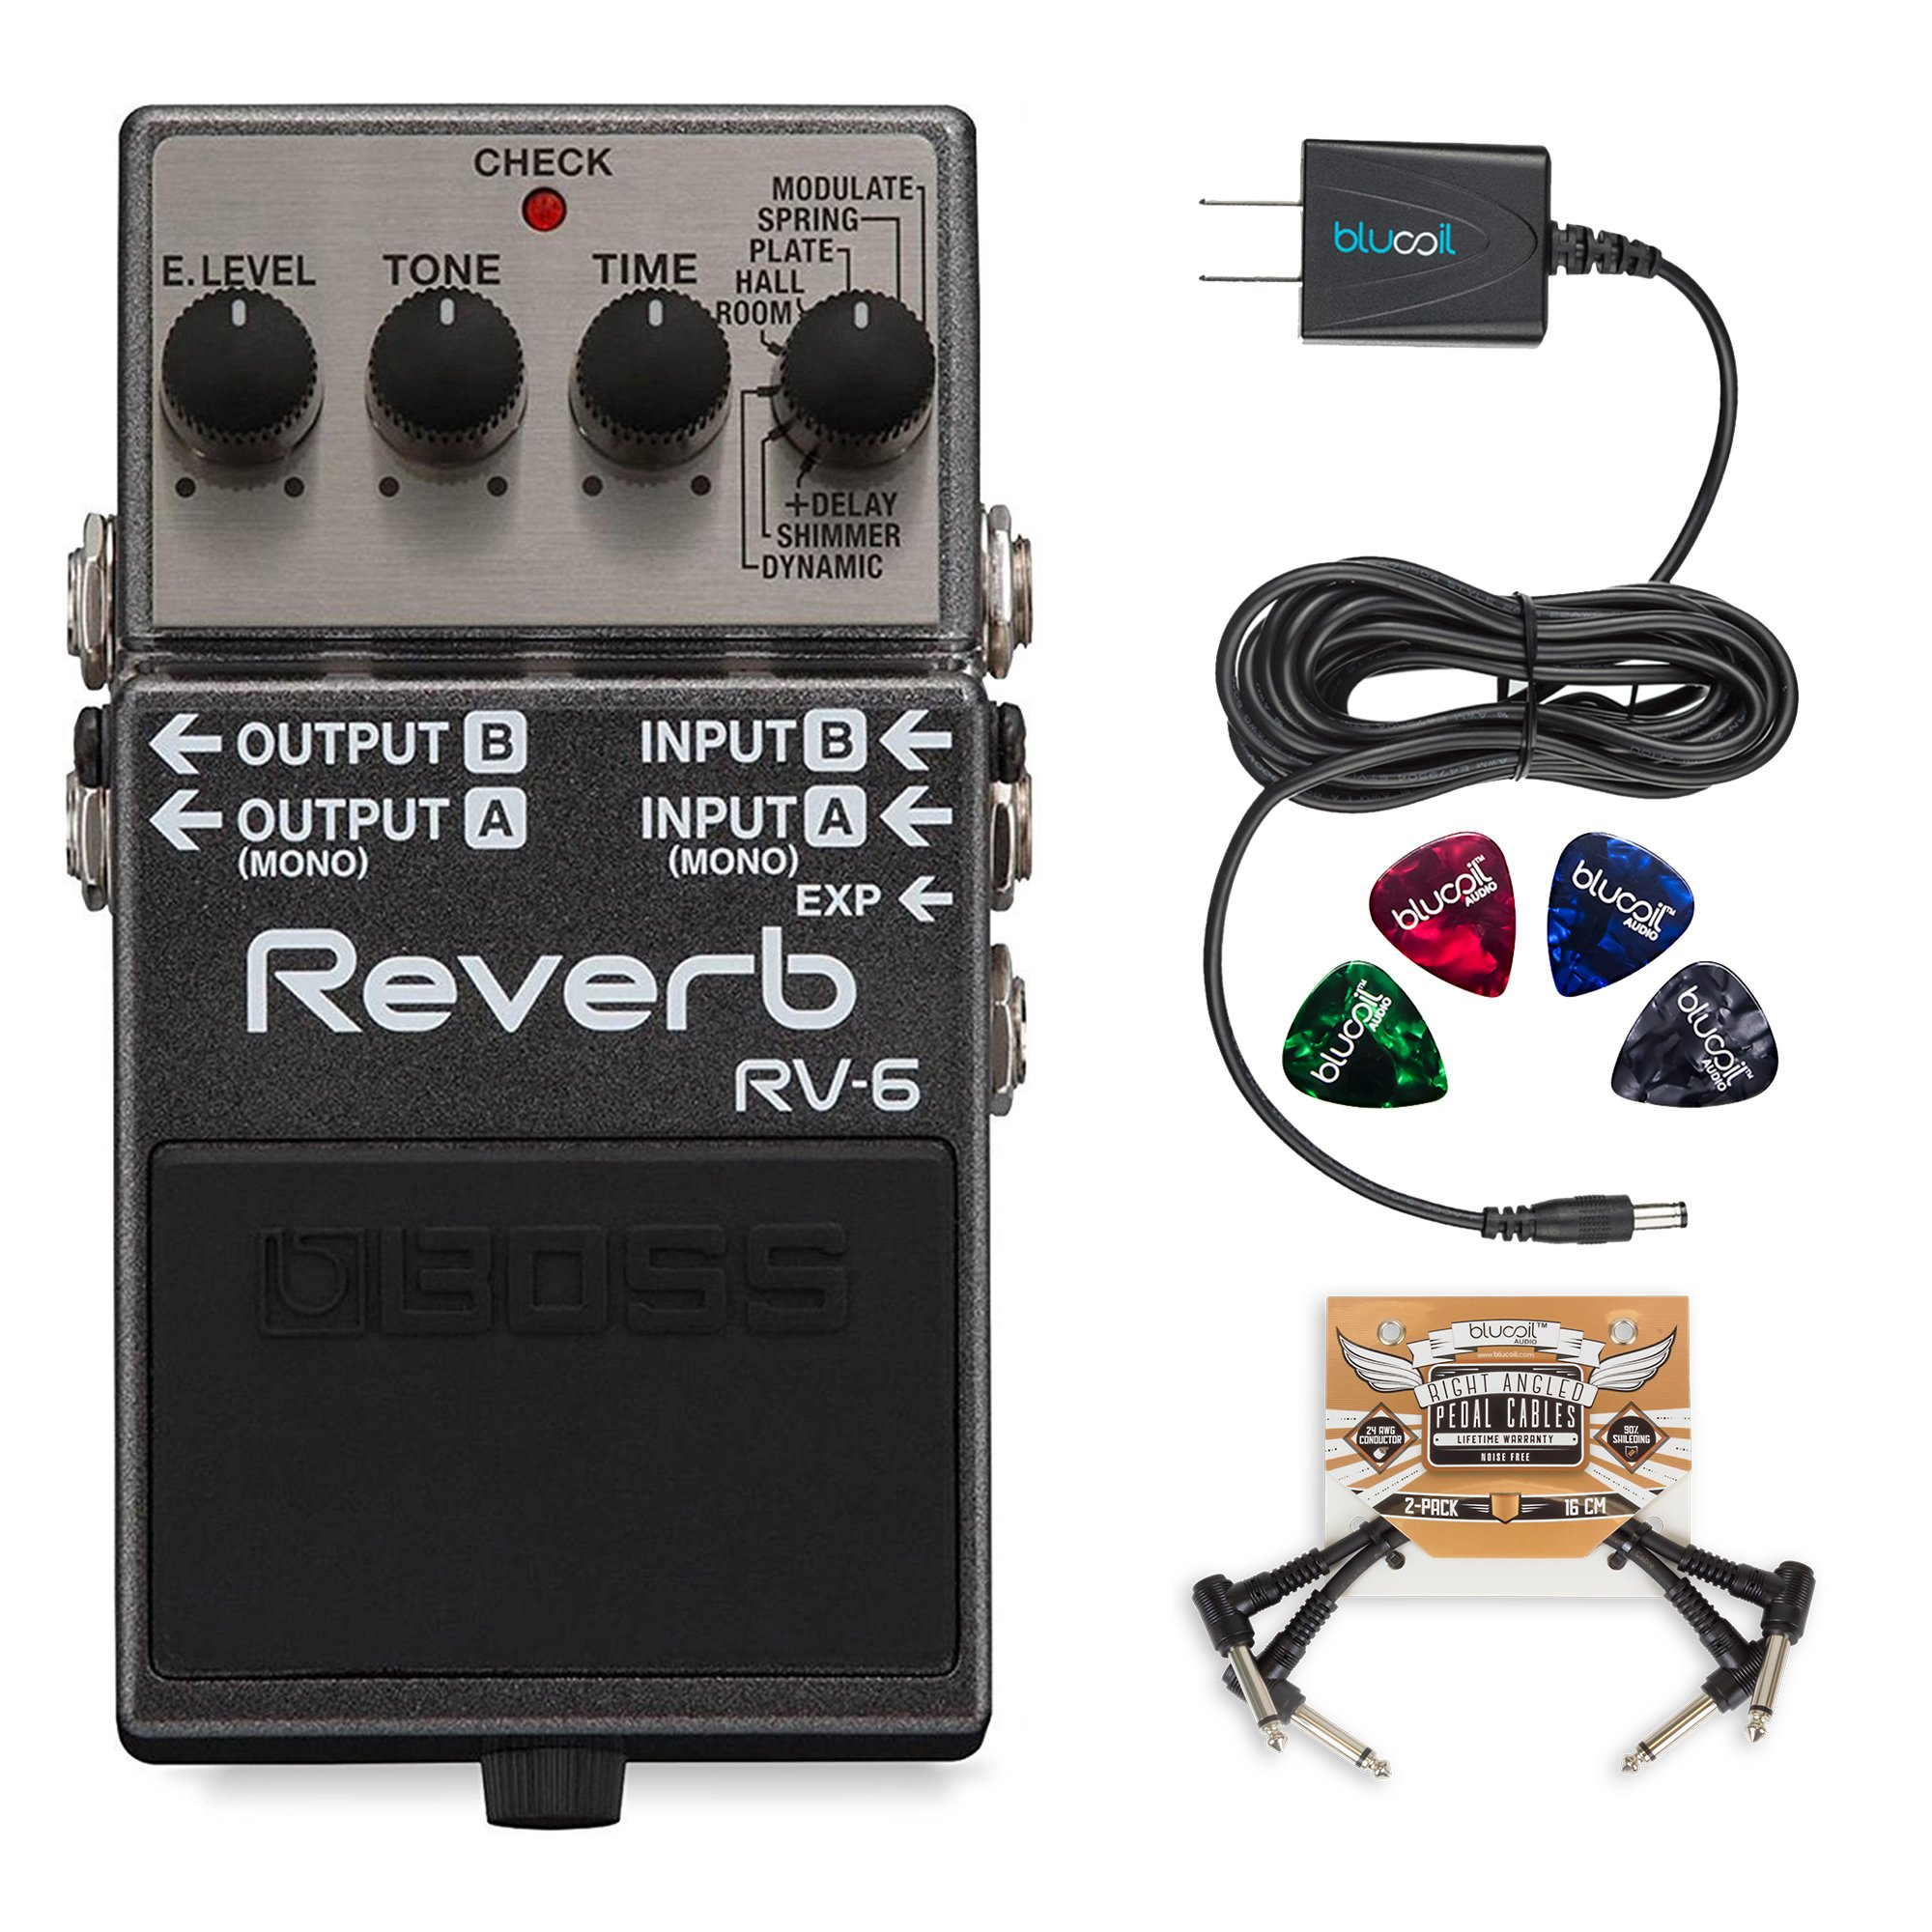 boss rv 6 digital reverb pedal bundle with 2 pack of blucoil pedal patch cables slim 9v 670ma. Black Bedroom Furniture Sets. Home Design Ideas